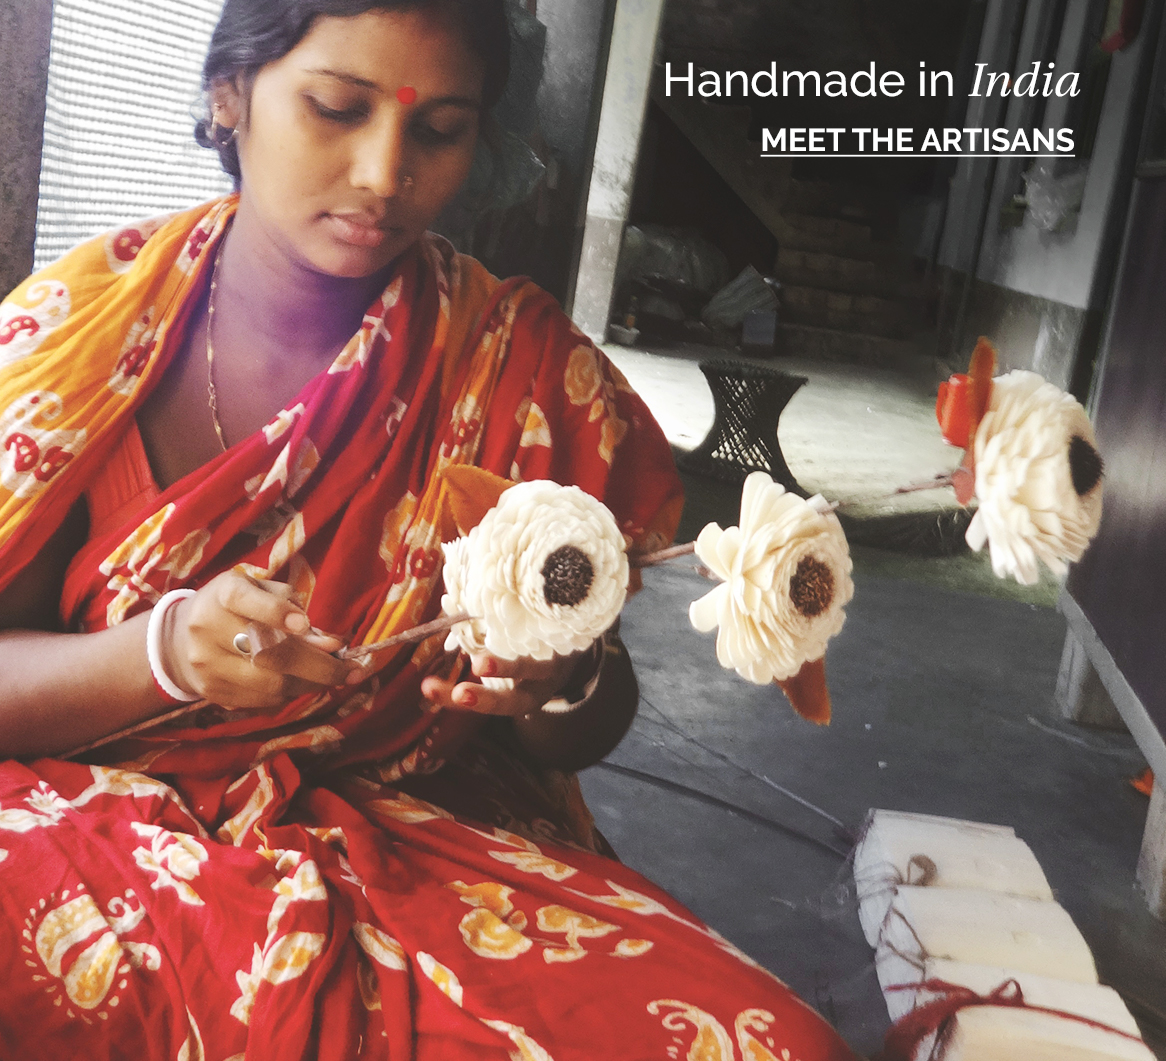 Handmade from India